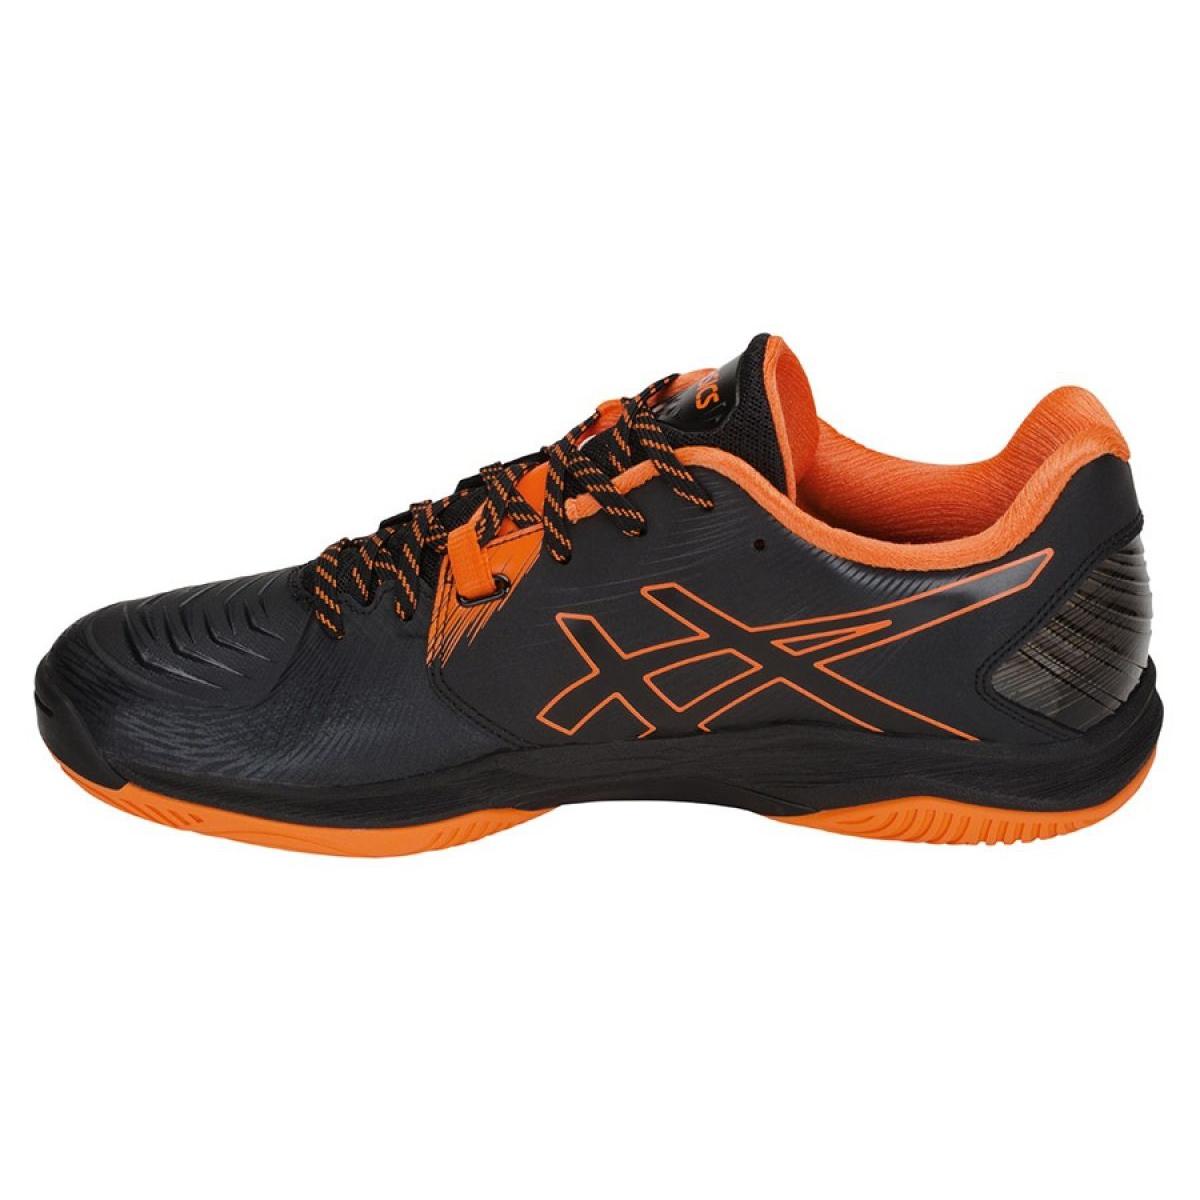 grand choix de 59d38 867b0 Handball shoes Asics Blast Ff M 1071A002-601